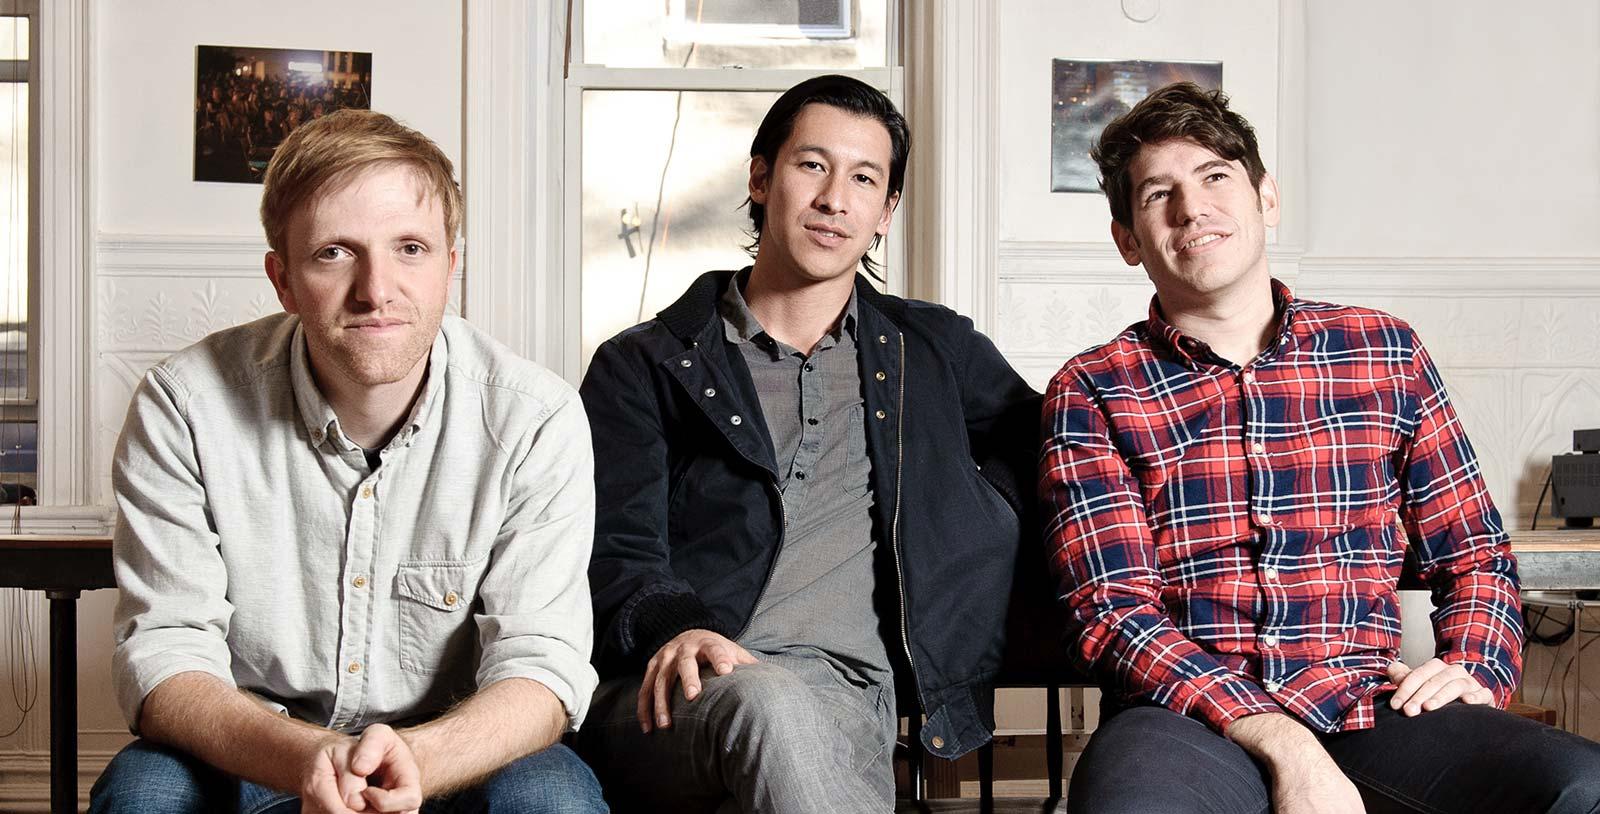 Les cofondateurs de Kickstarter, Charles Adler, Perry Chen et Yancey Strickler.